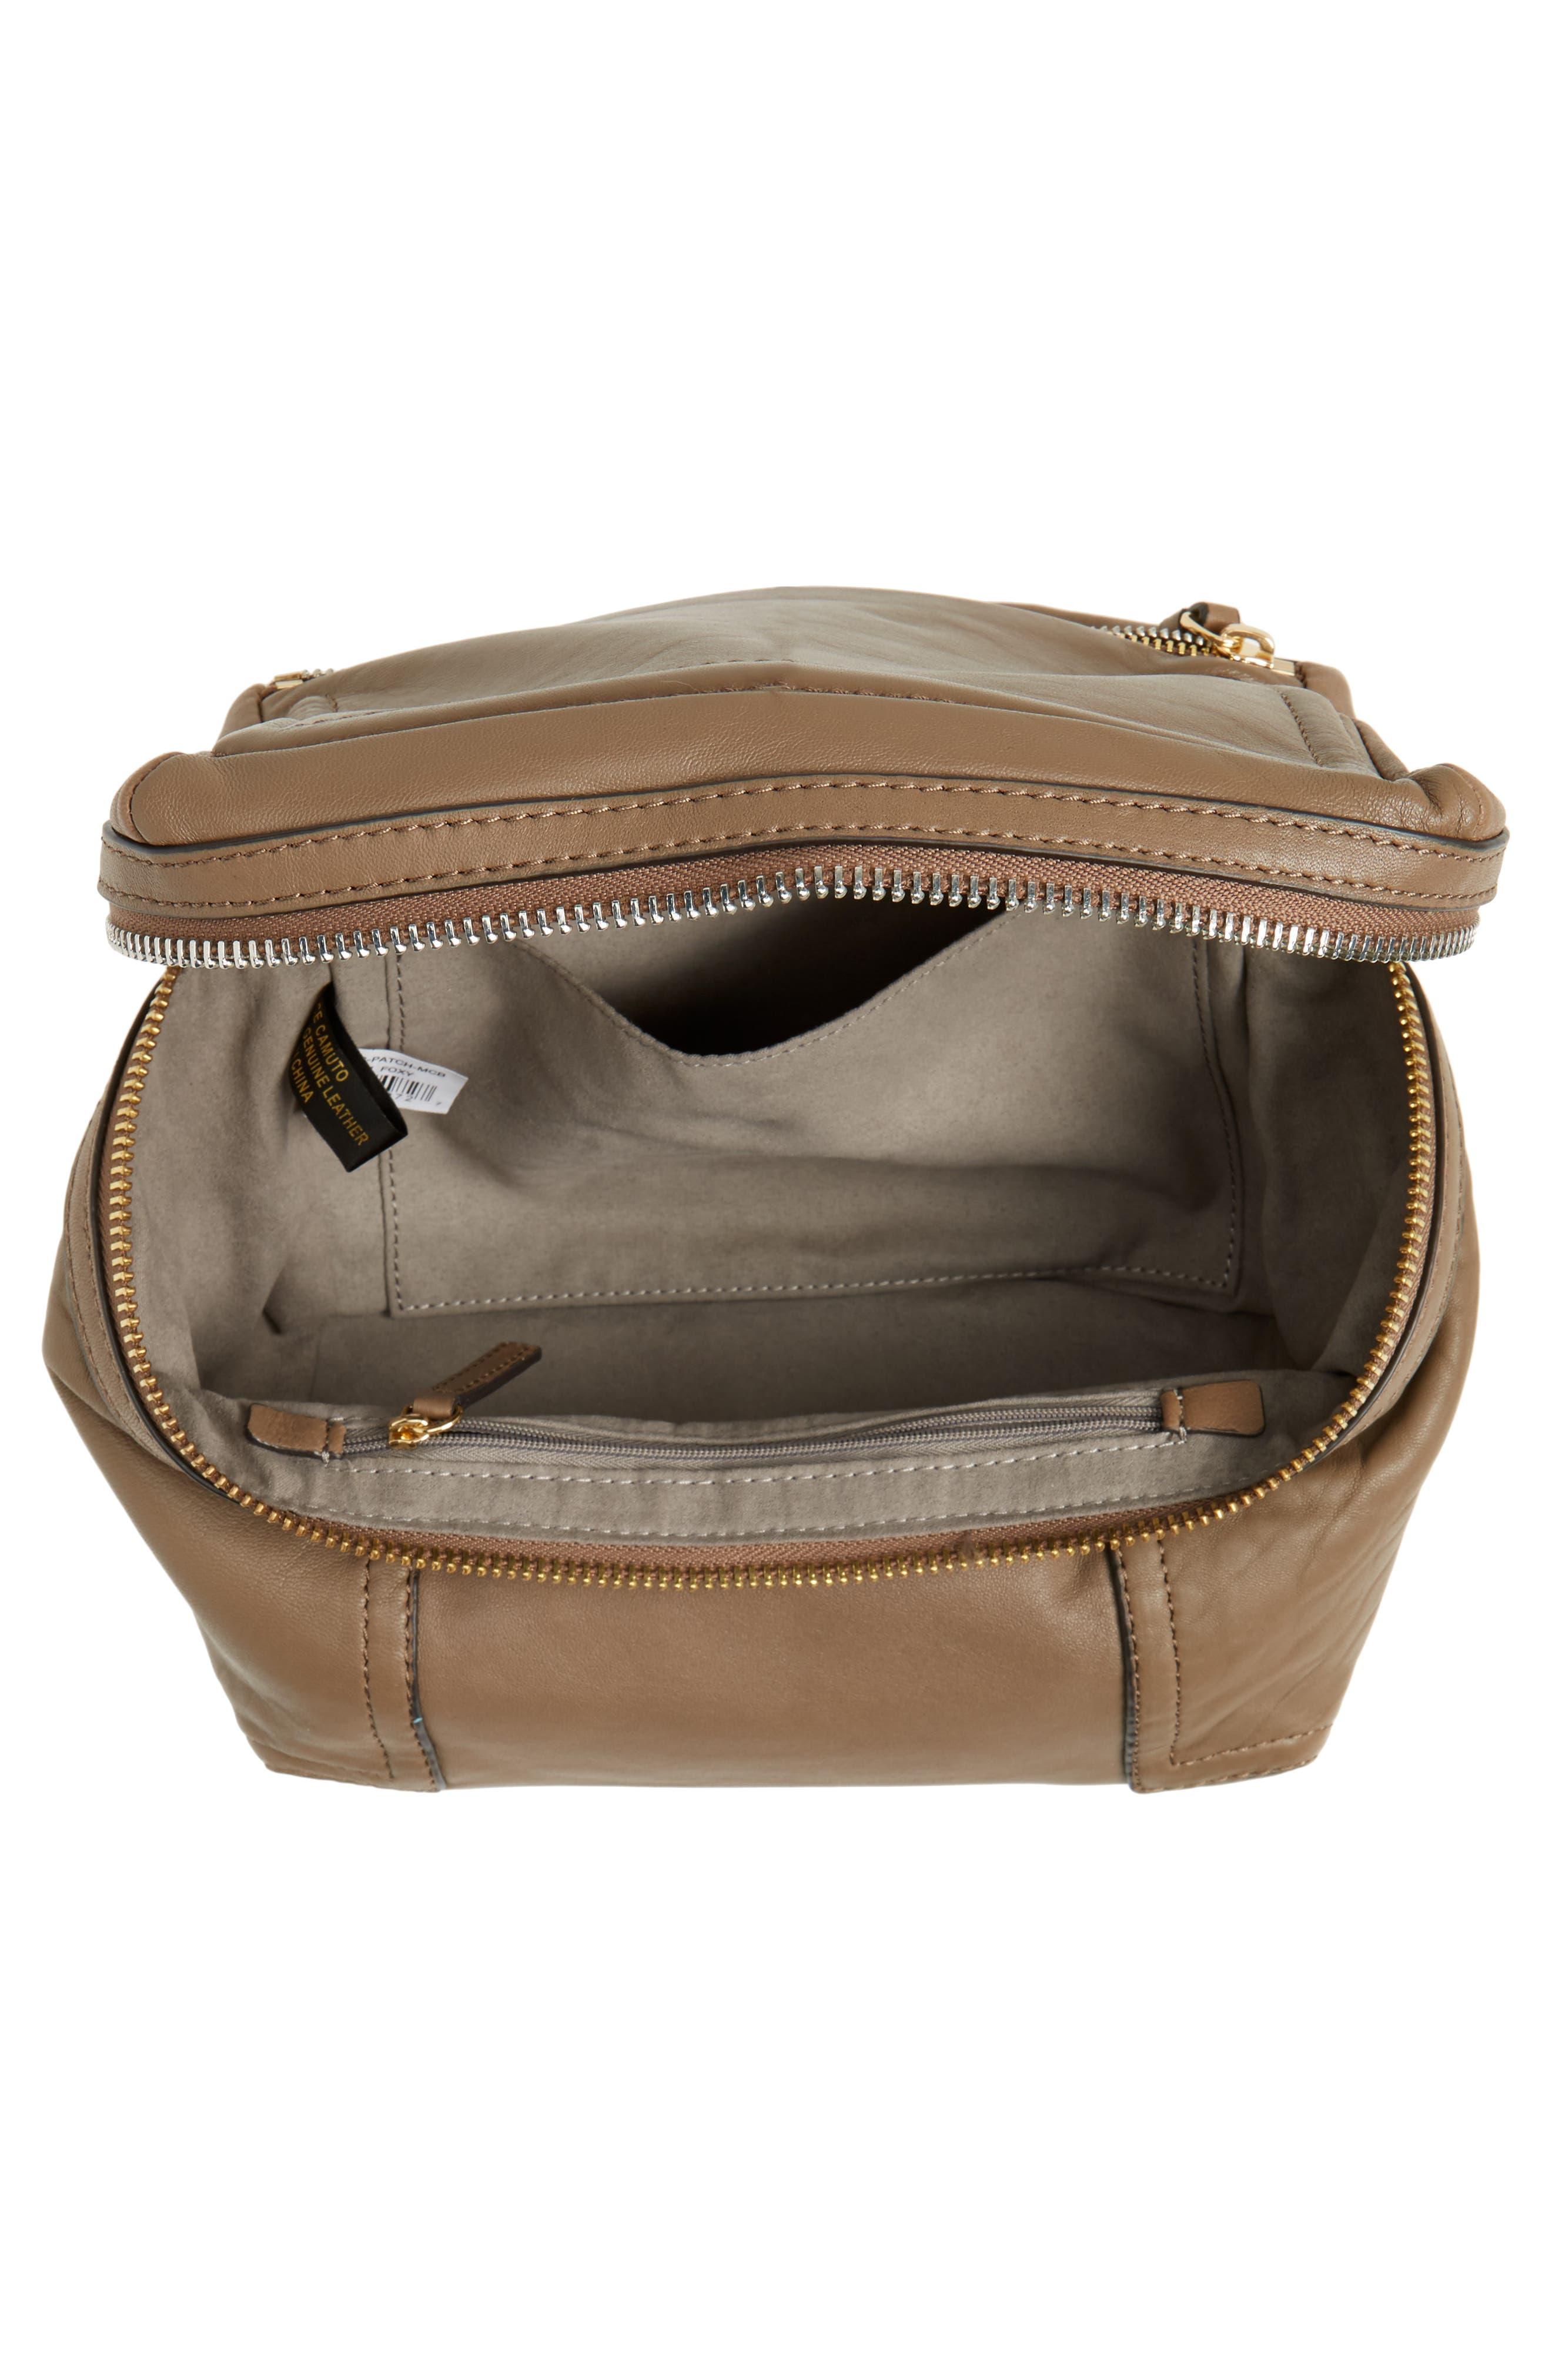 Medium Patch Leather Crossbody Bag,                             Alternate thumbnail 8, color,